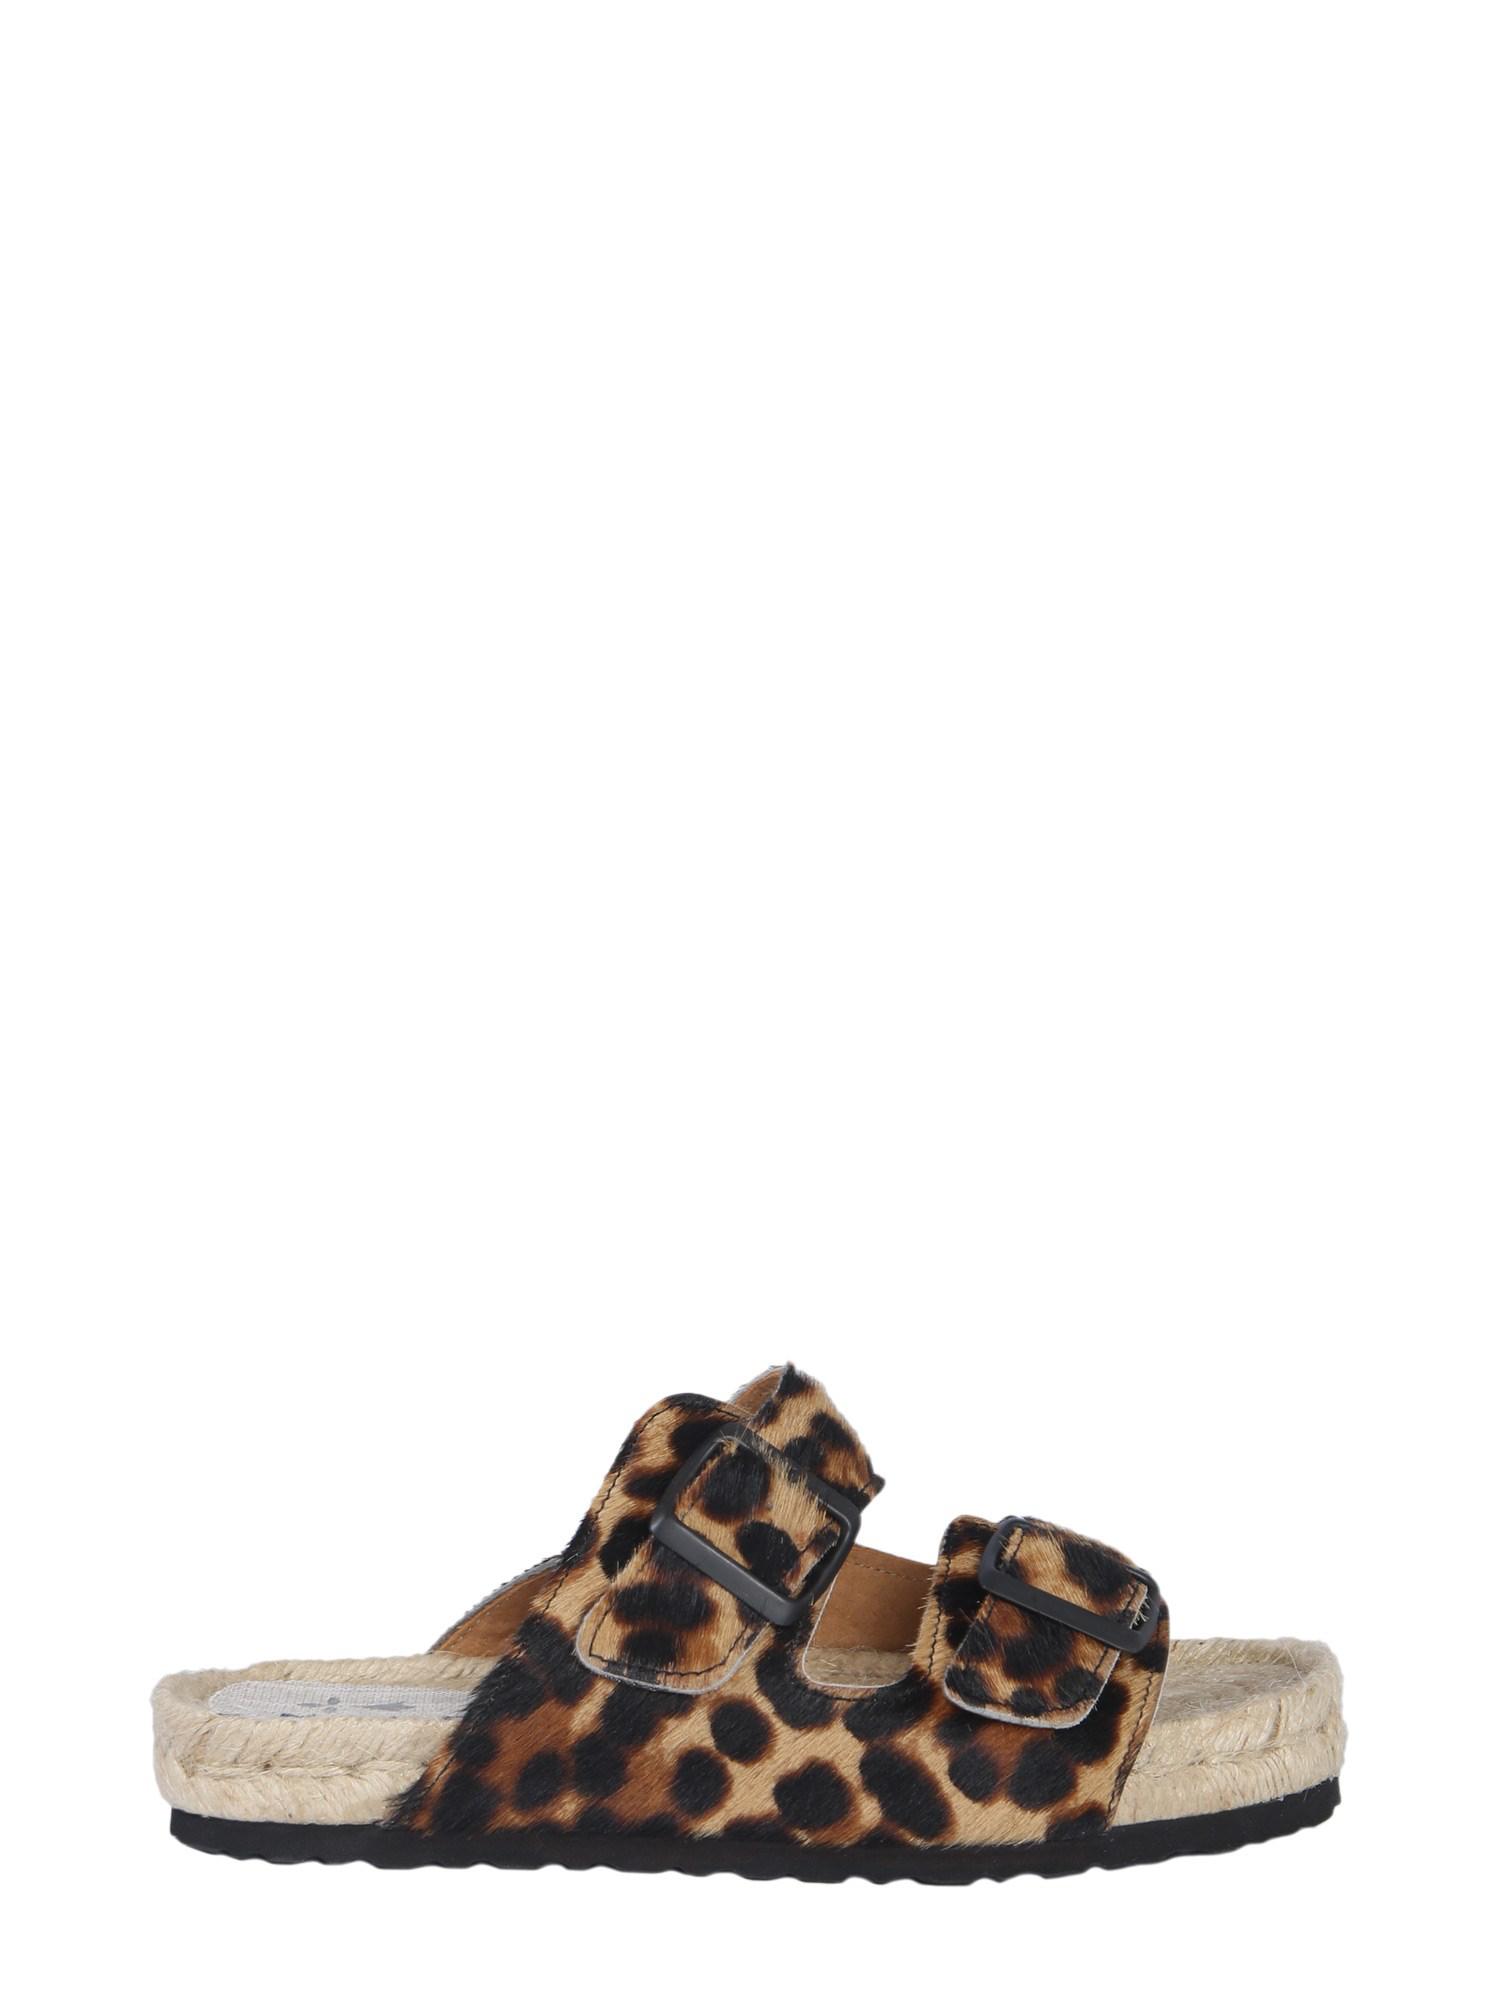 5edc5ccf93a Manebi Leopard Leather Sandals In Multicolour